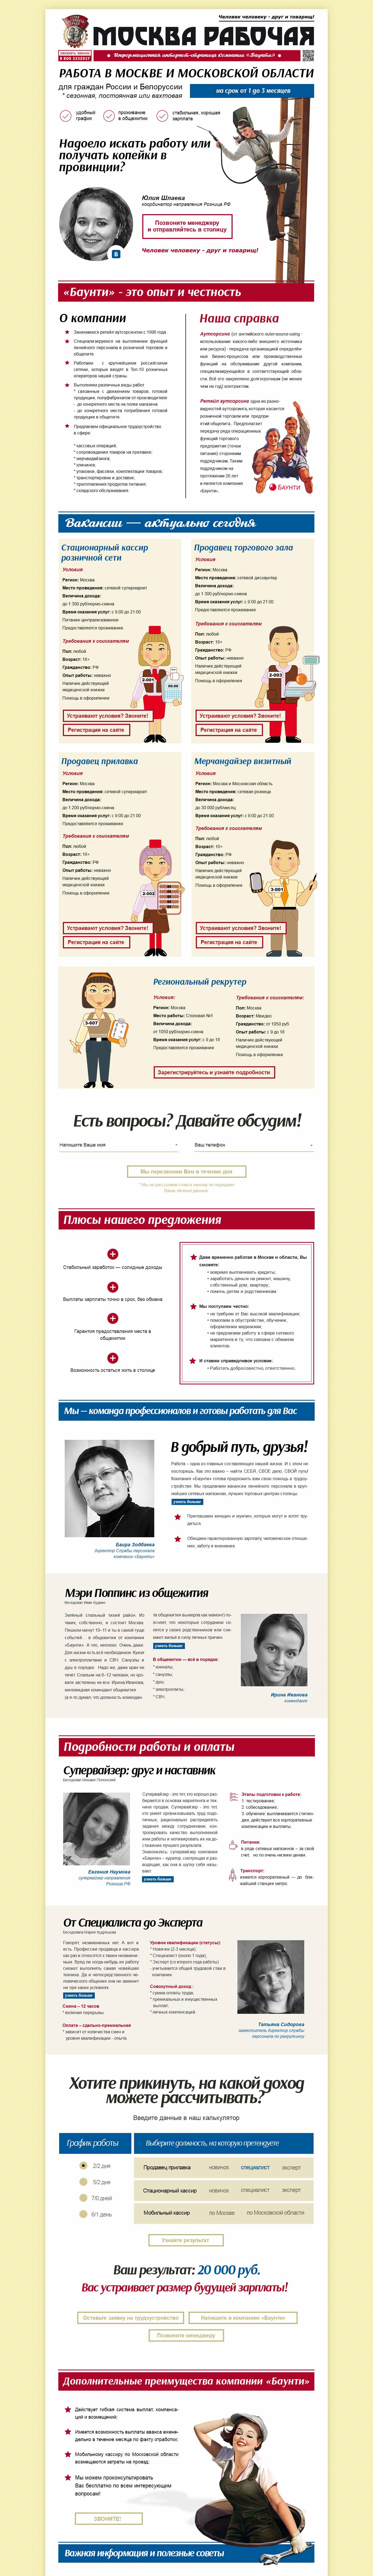 LANDING PAGE Баунти_1